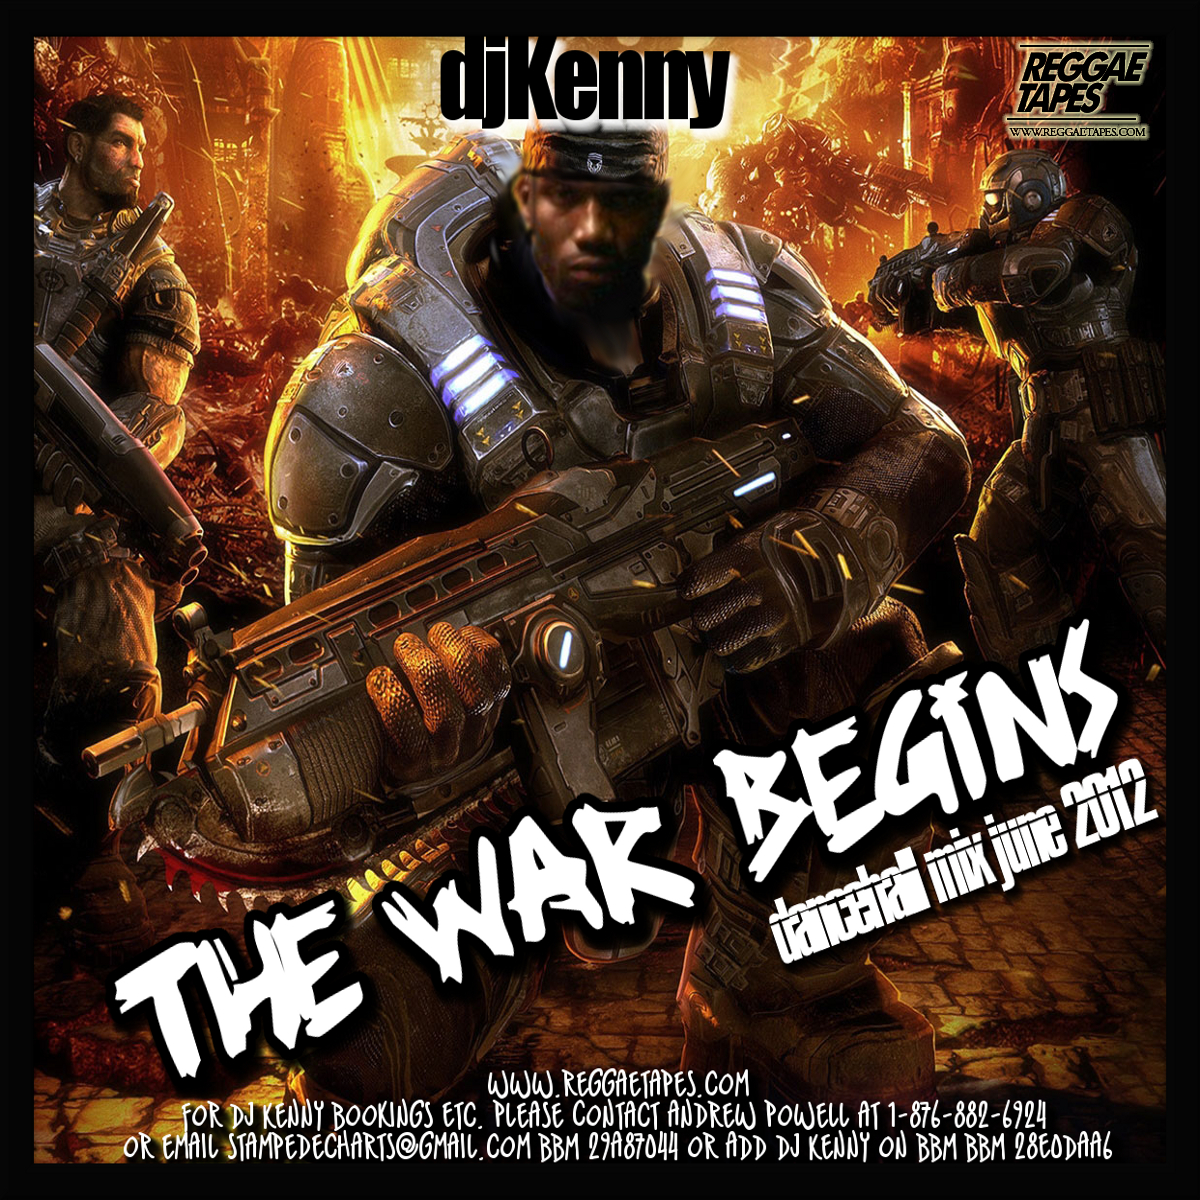 DJ+KENNY+-+THE+WAR+BEGINS+JUNE+2012.JPG